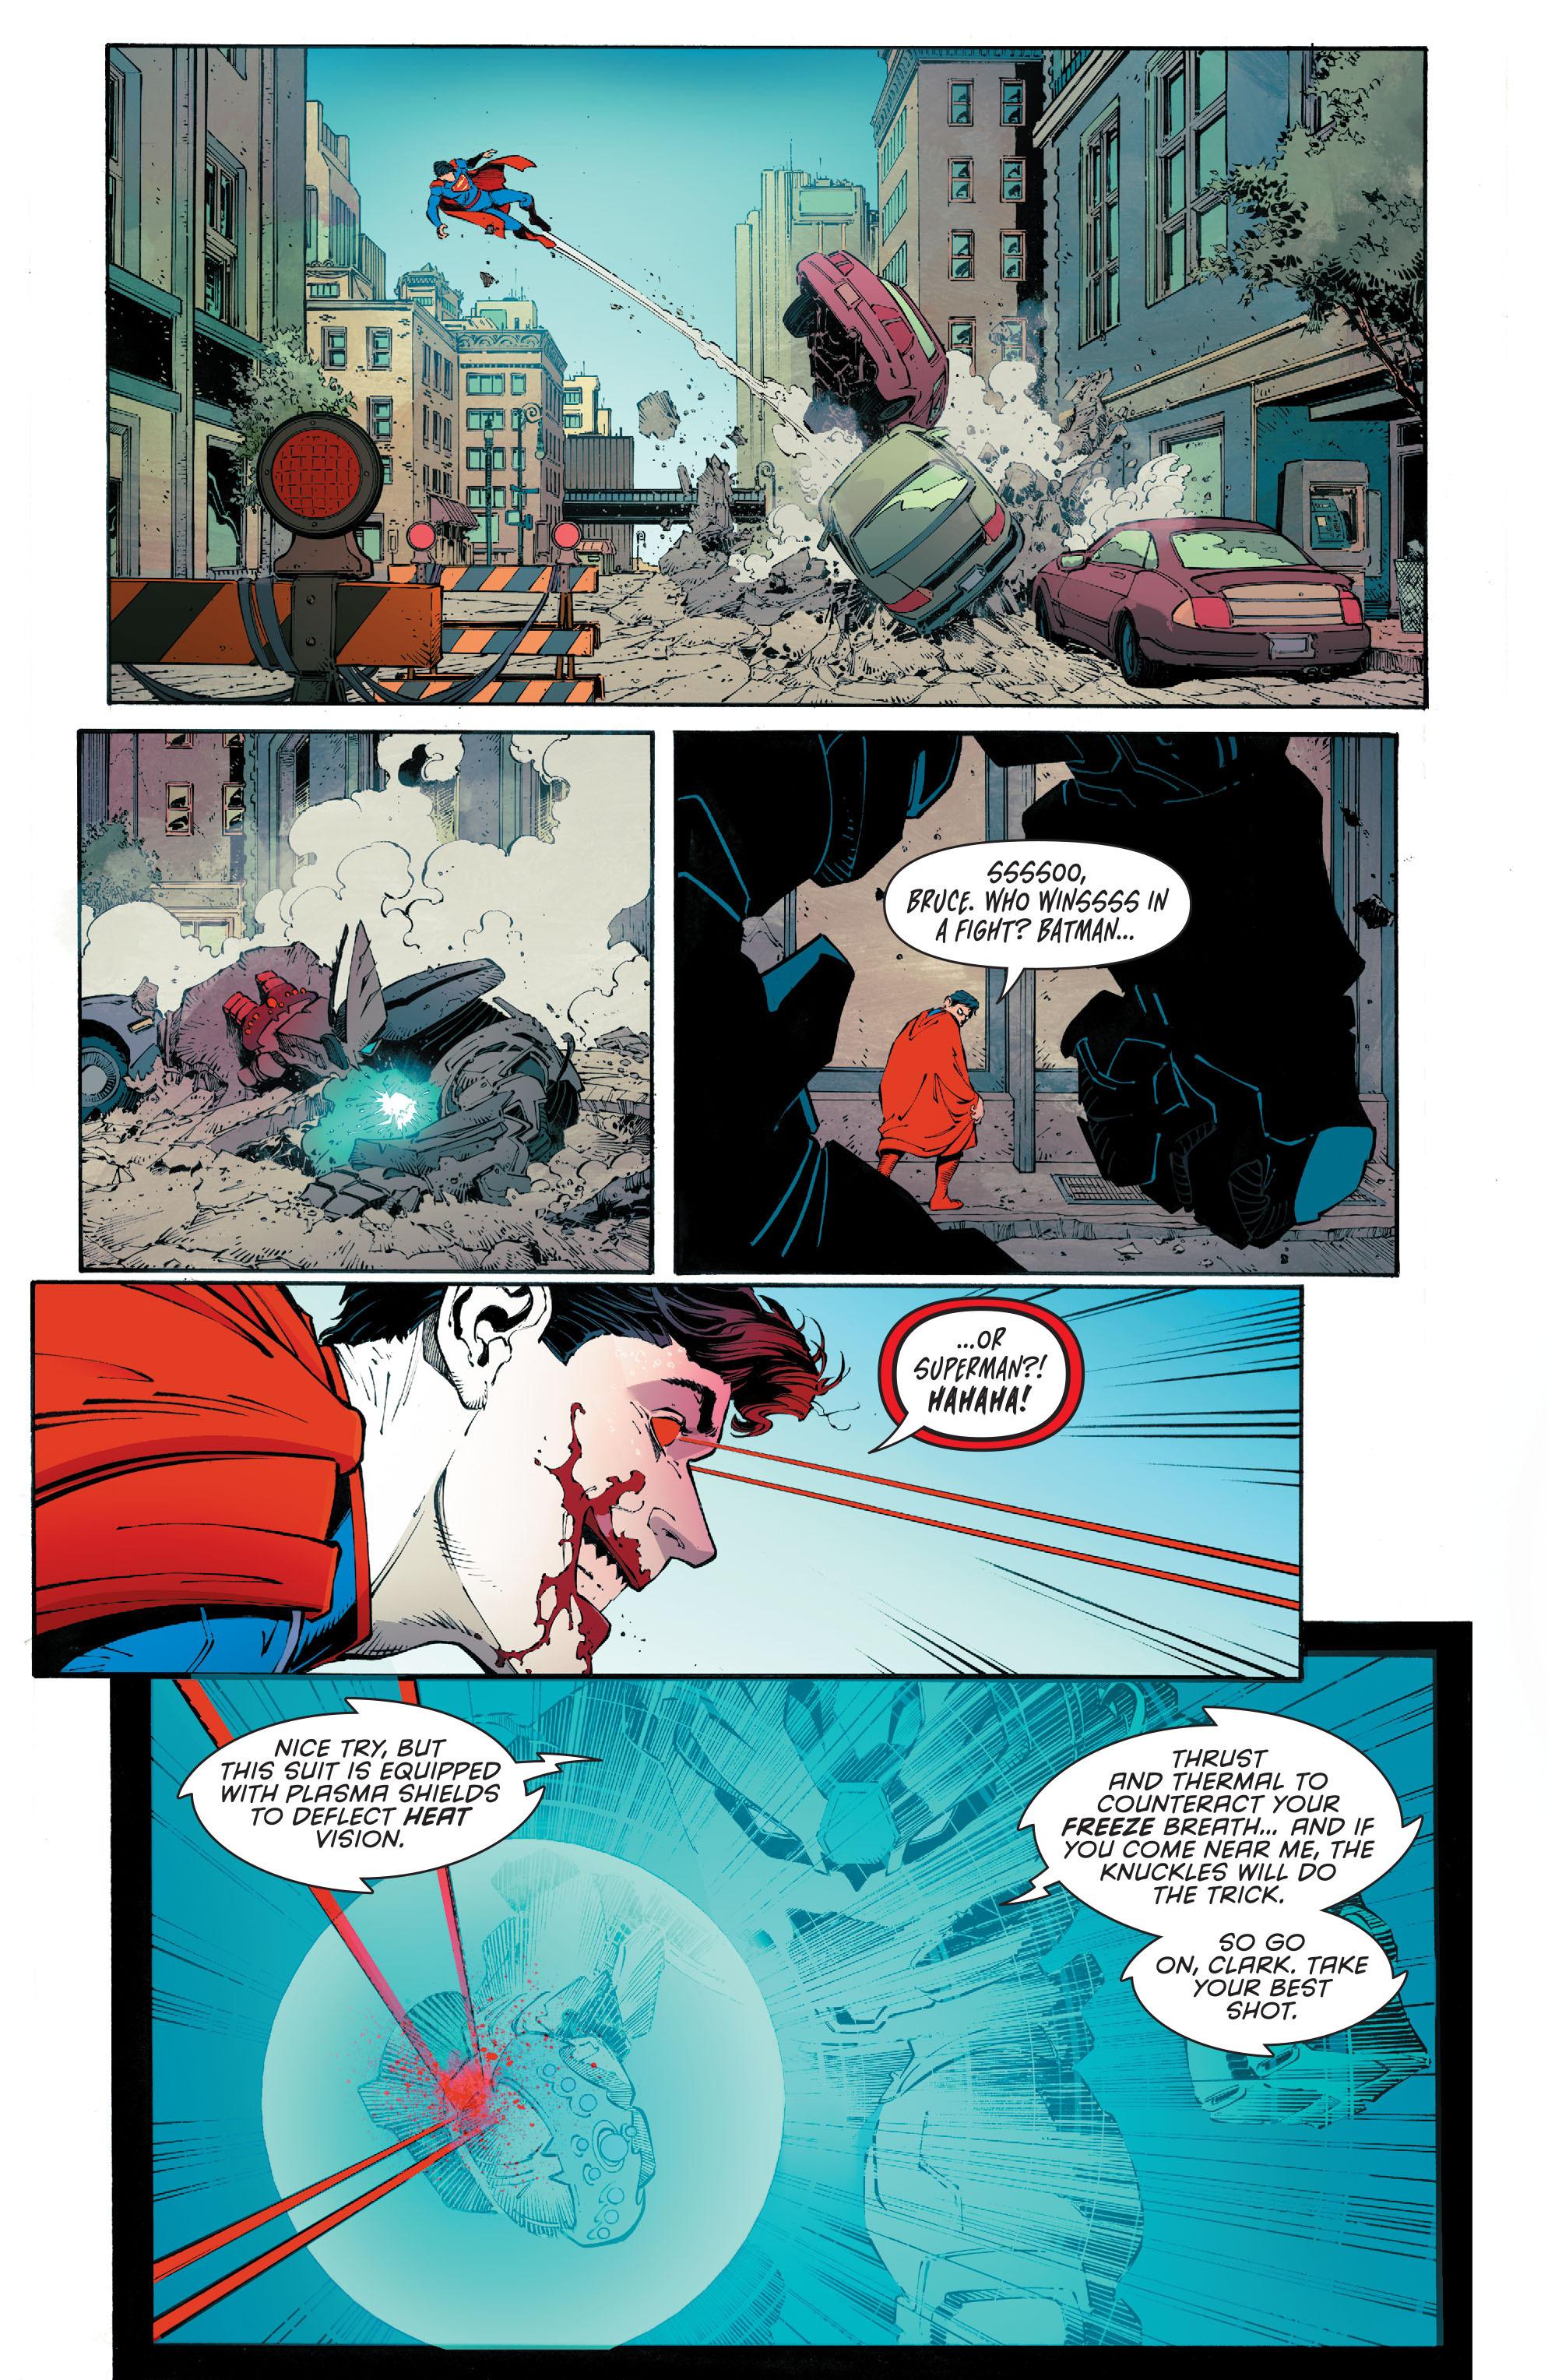 Batman Endgame Full | Viewcomic reading comics online for free 2019